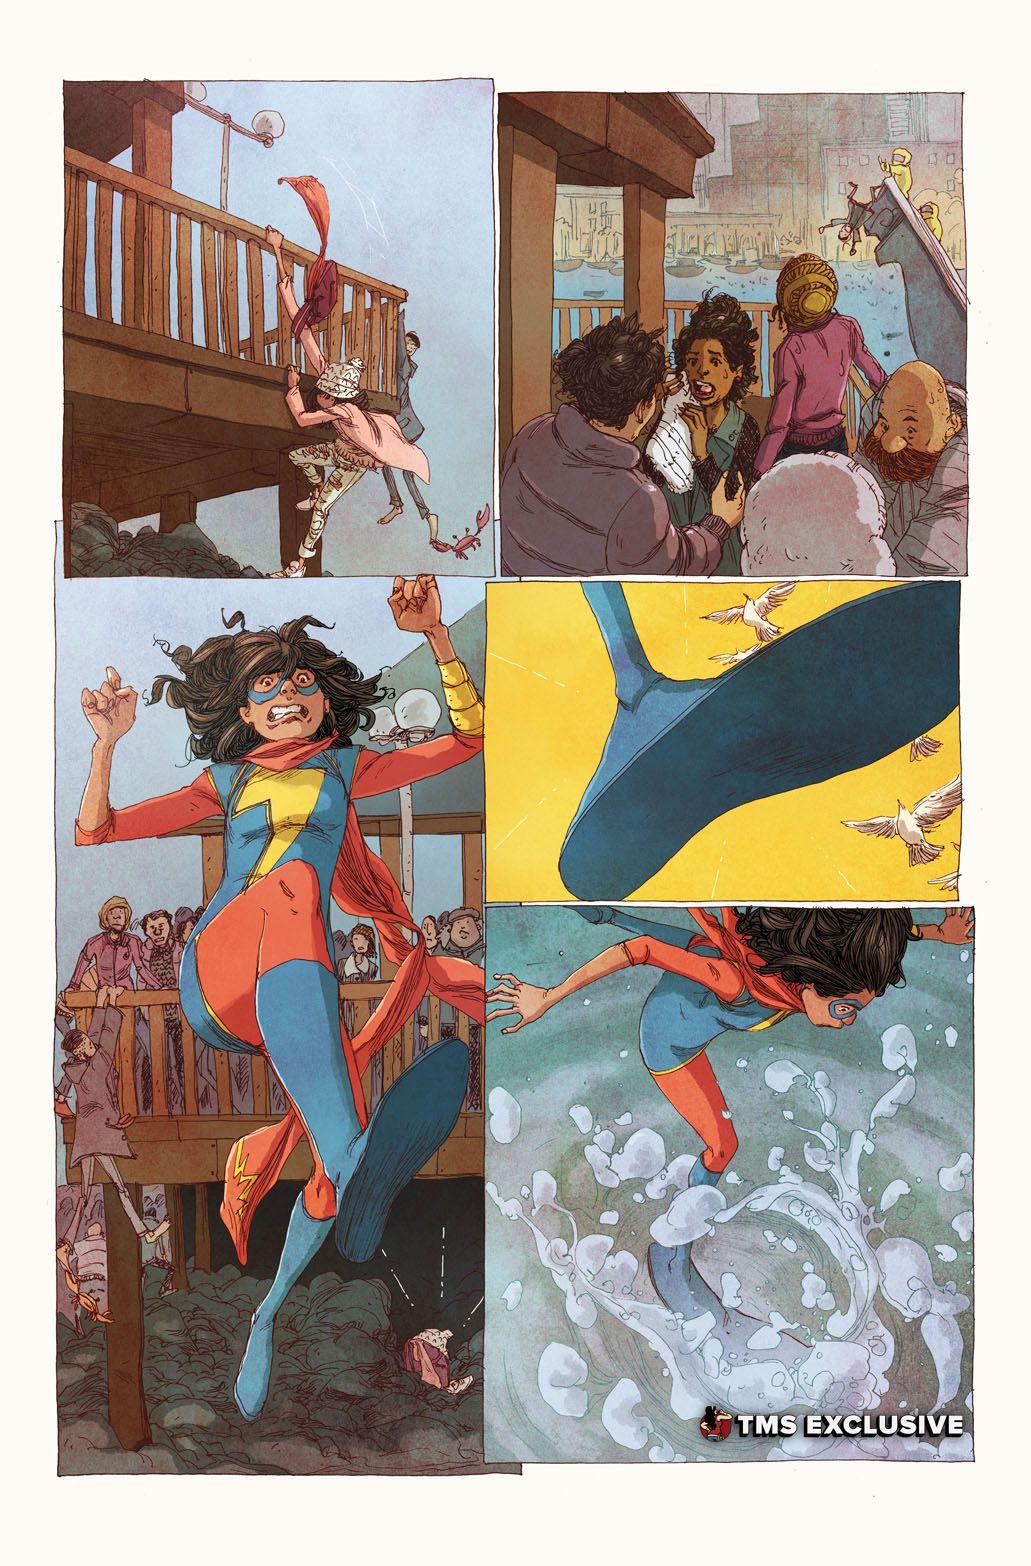 Ms. Marvel #16 - Art by Adrian Alphona